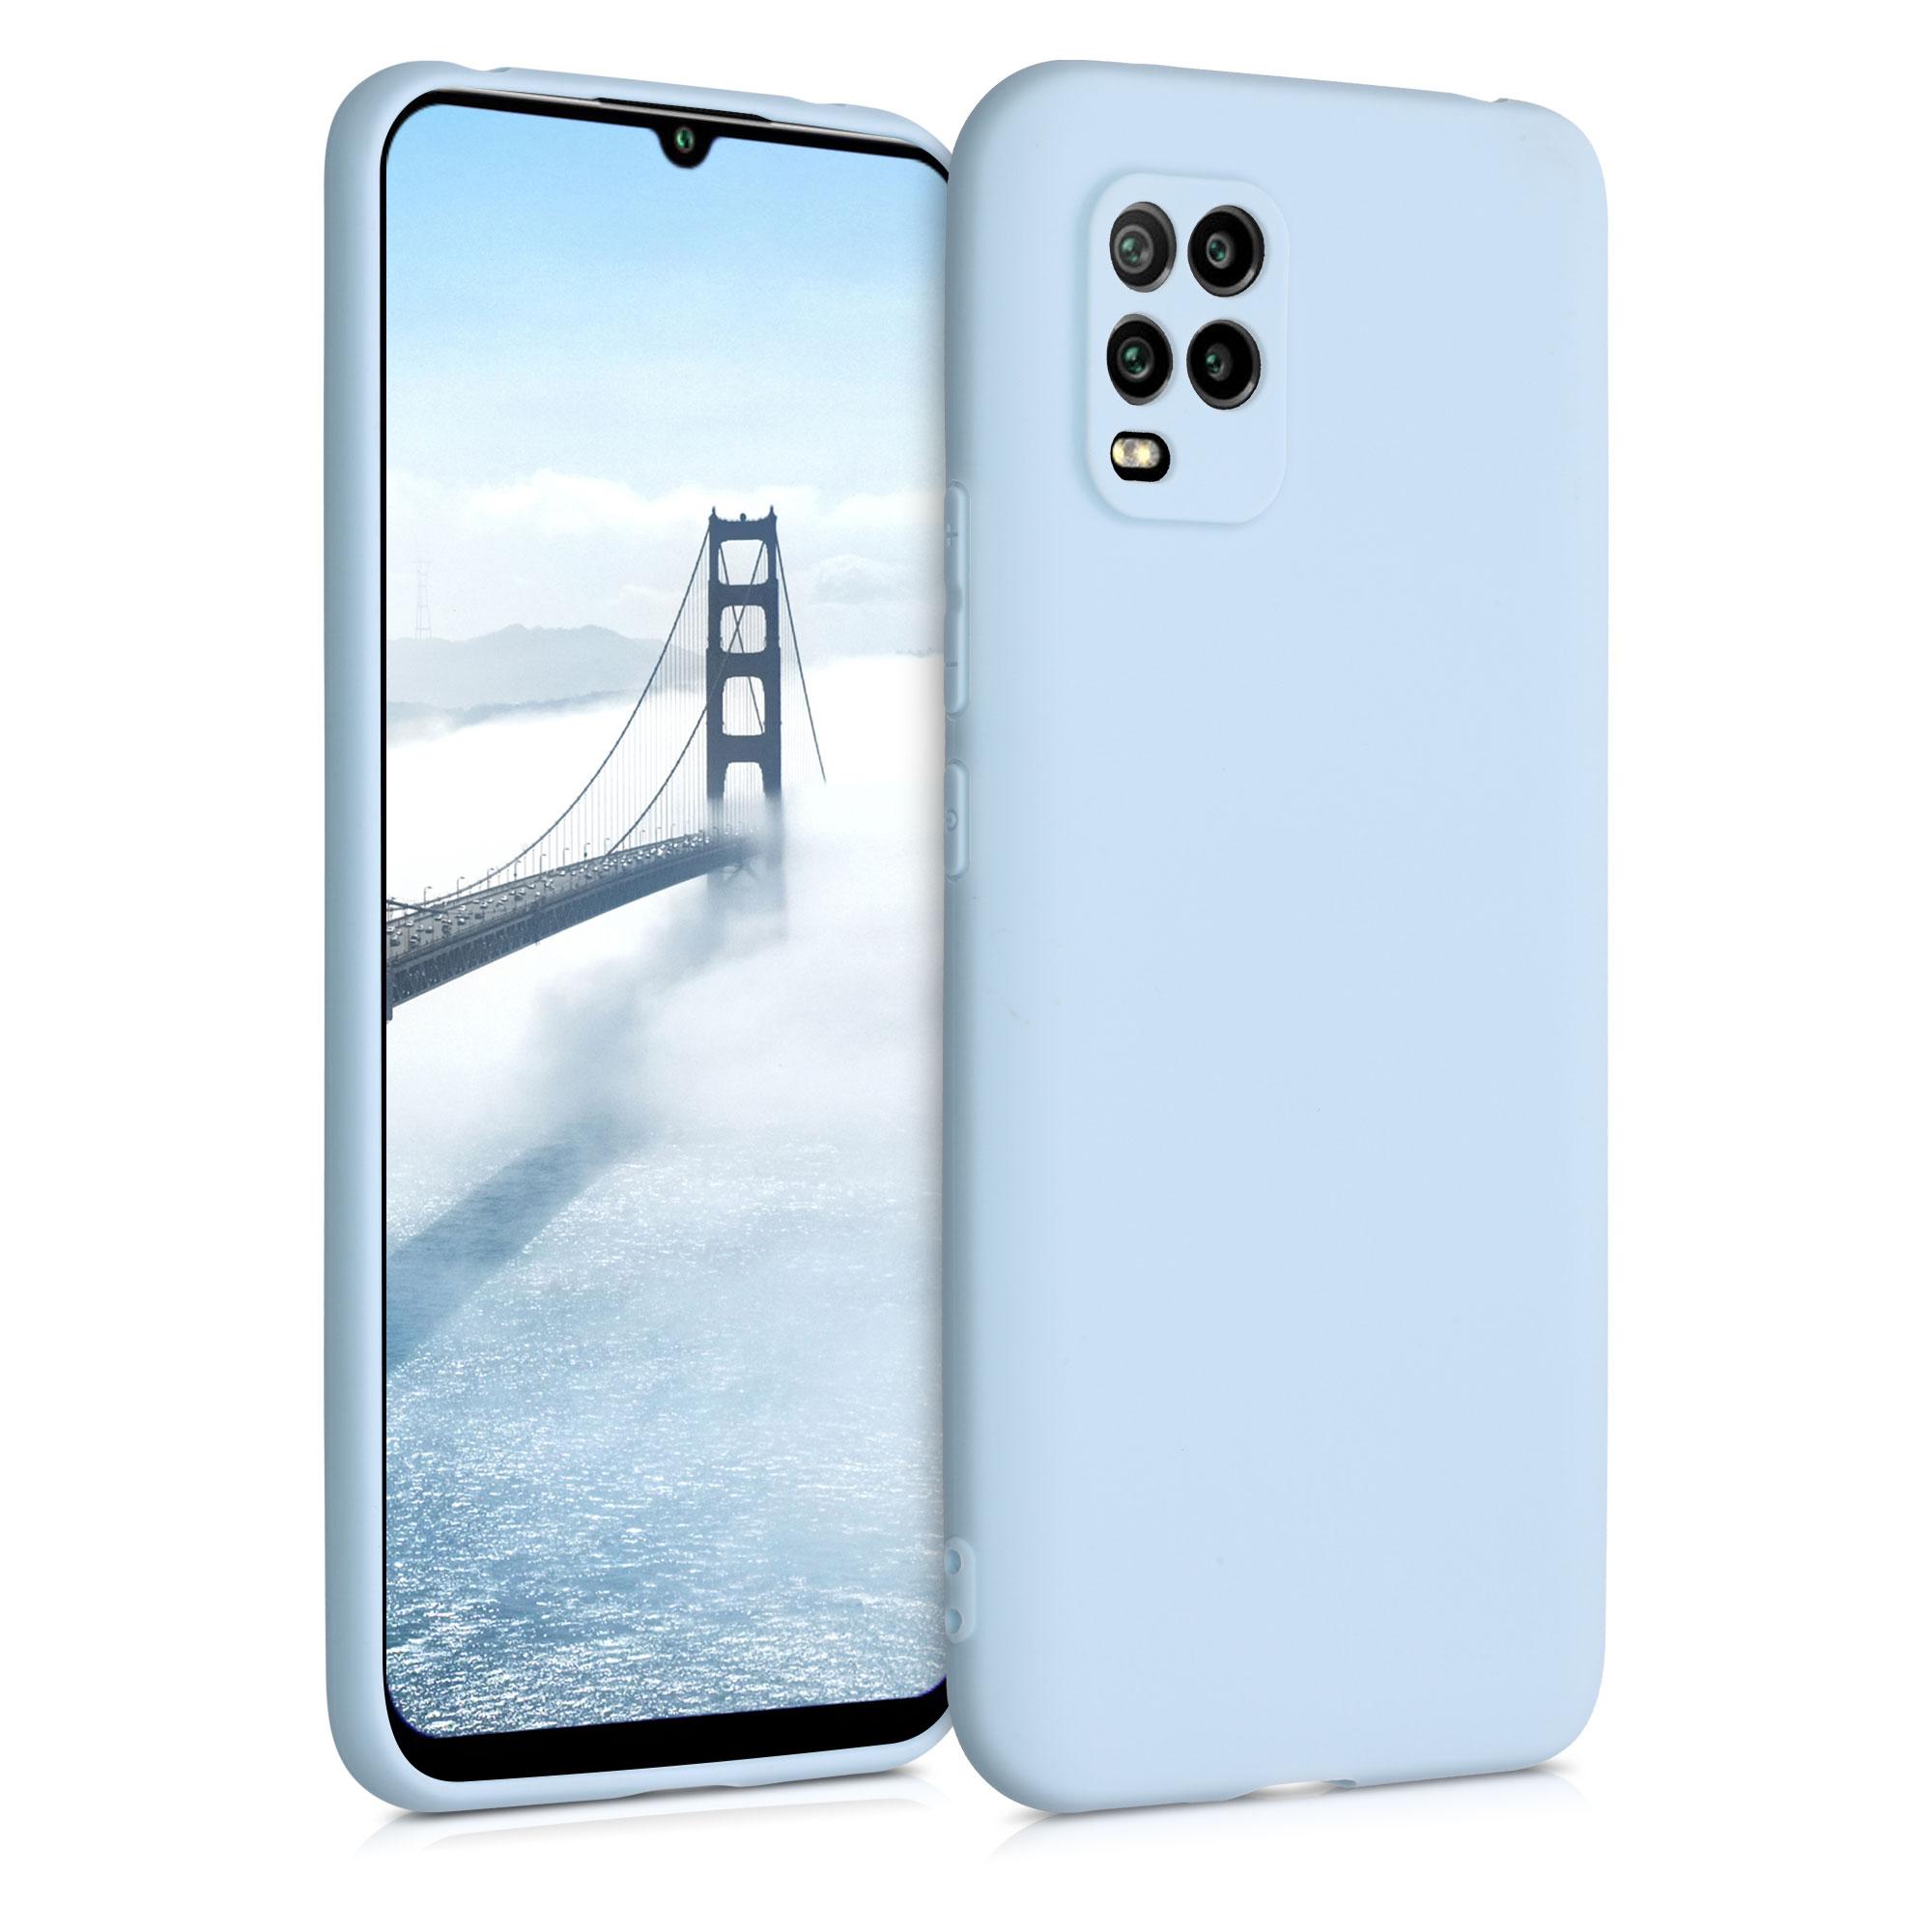 Pastelové modré silikonové pouzdro / obal pro Xiaomi Mi 10 Lite